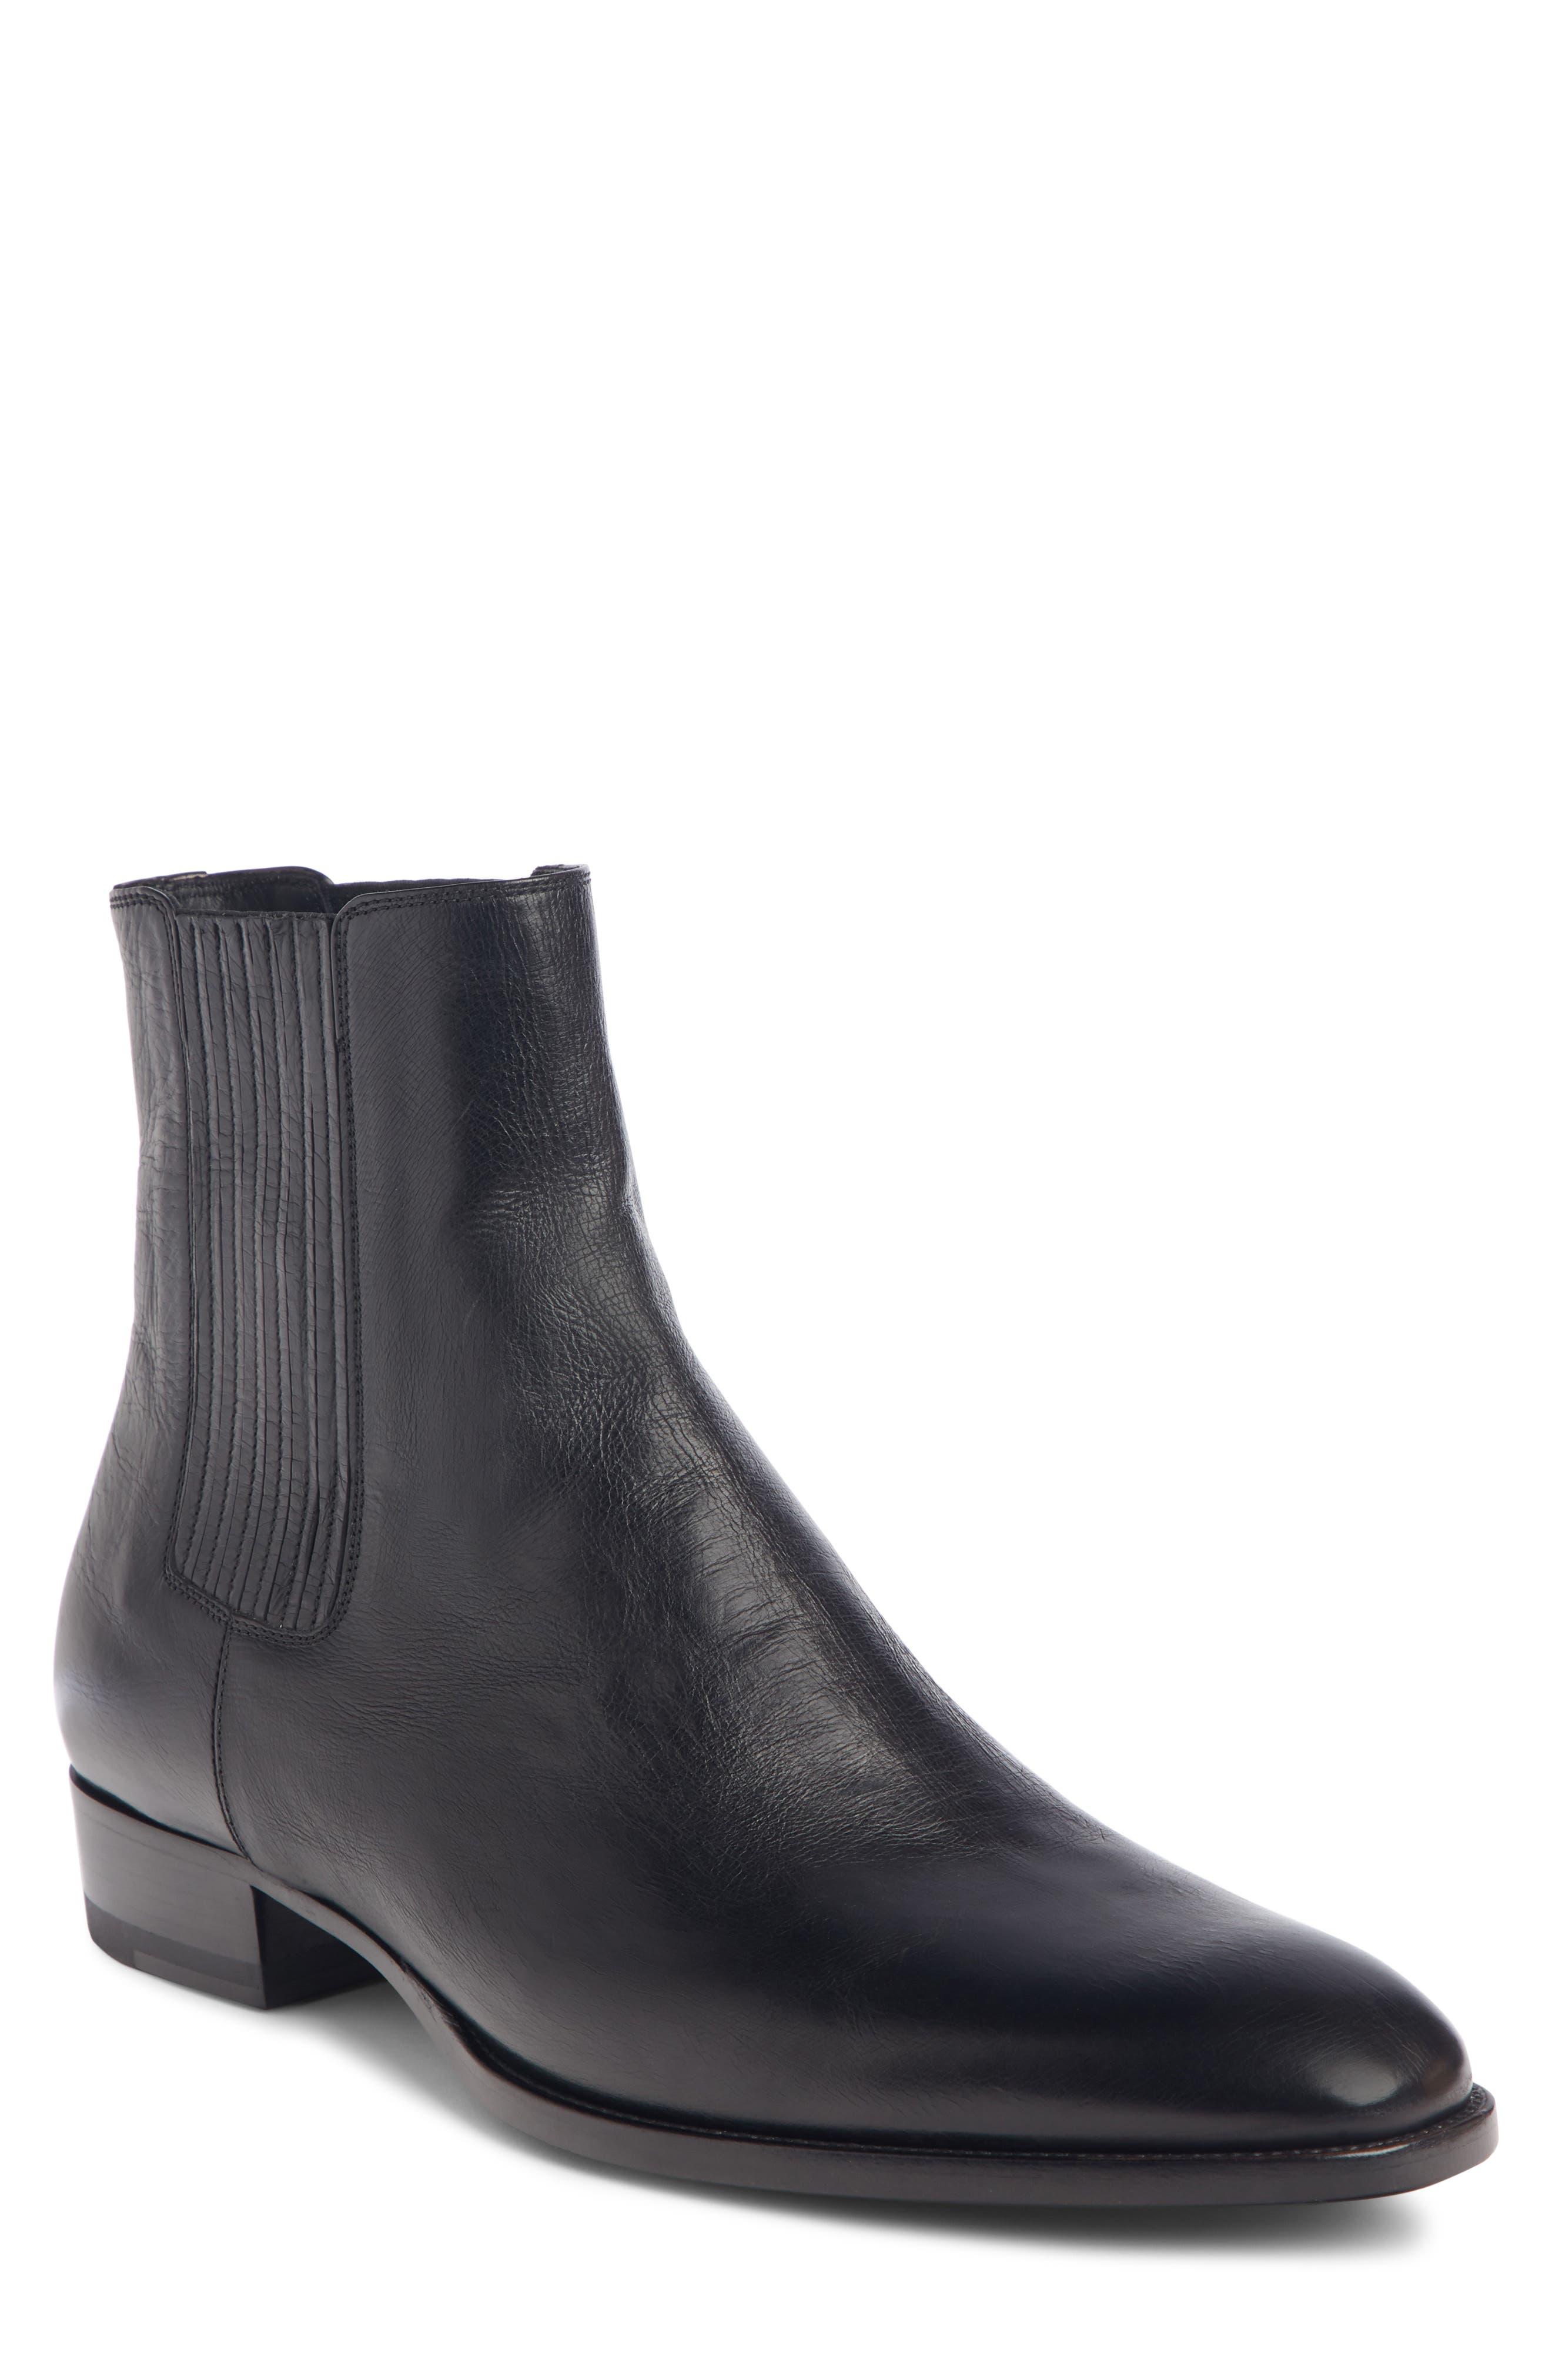 saint laurent wyatt leather chelsea boots